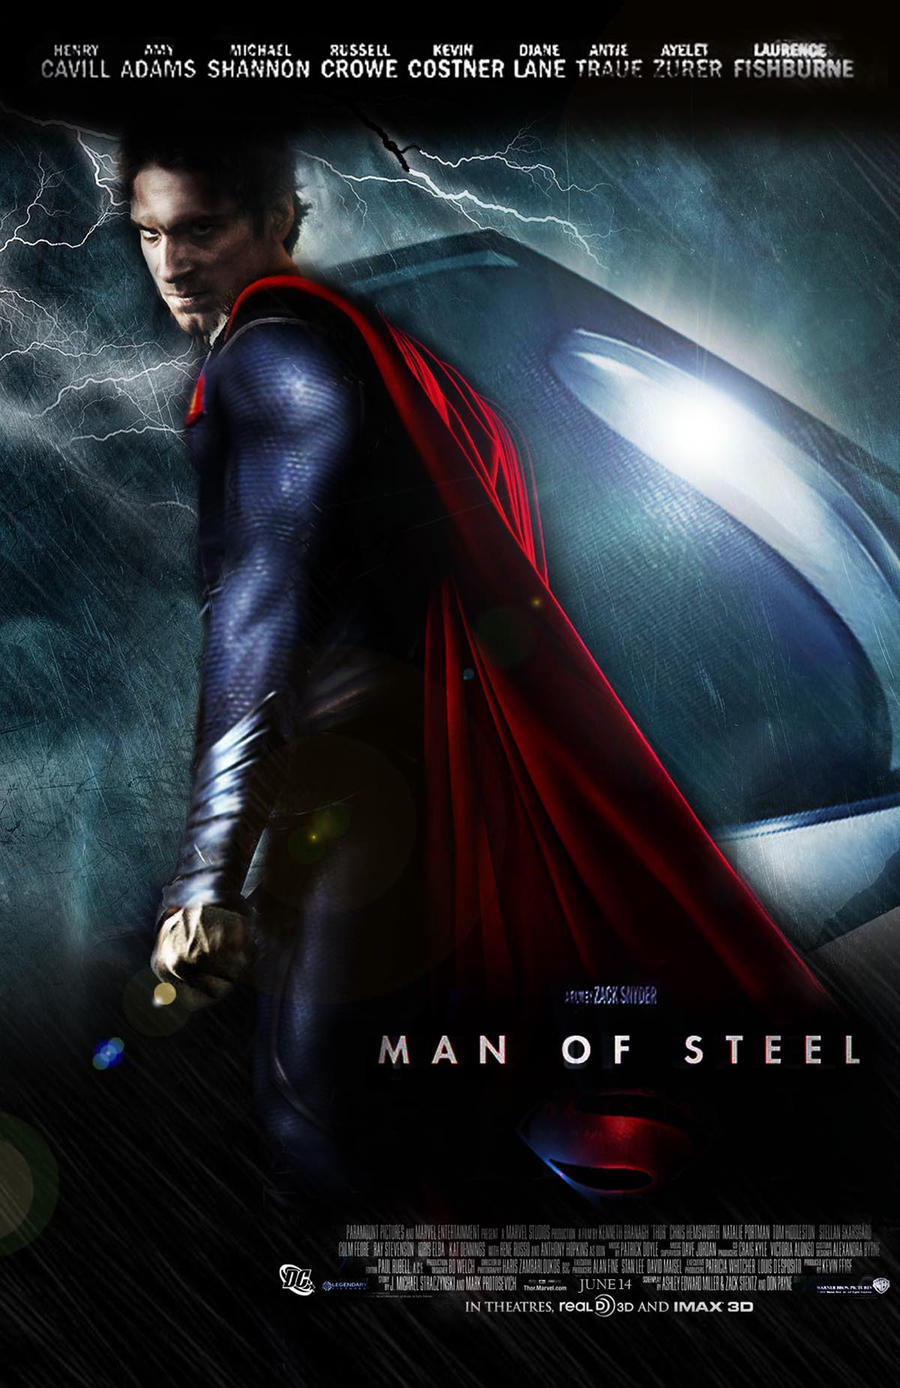 Man of Steel promo poster by Kyl-el7 on DeviantArt